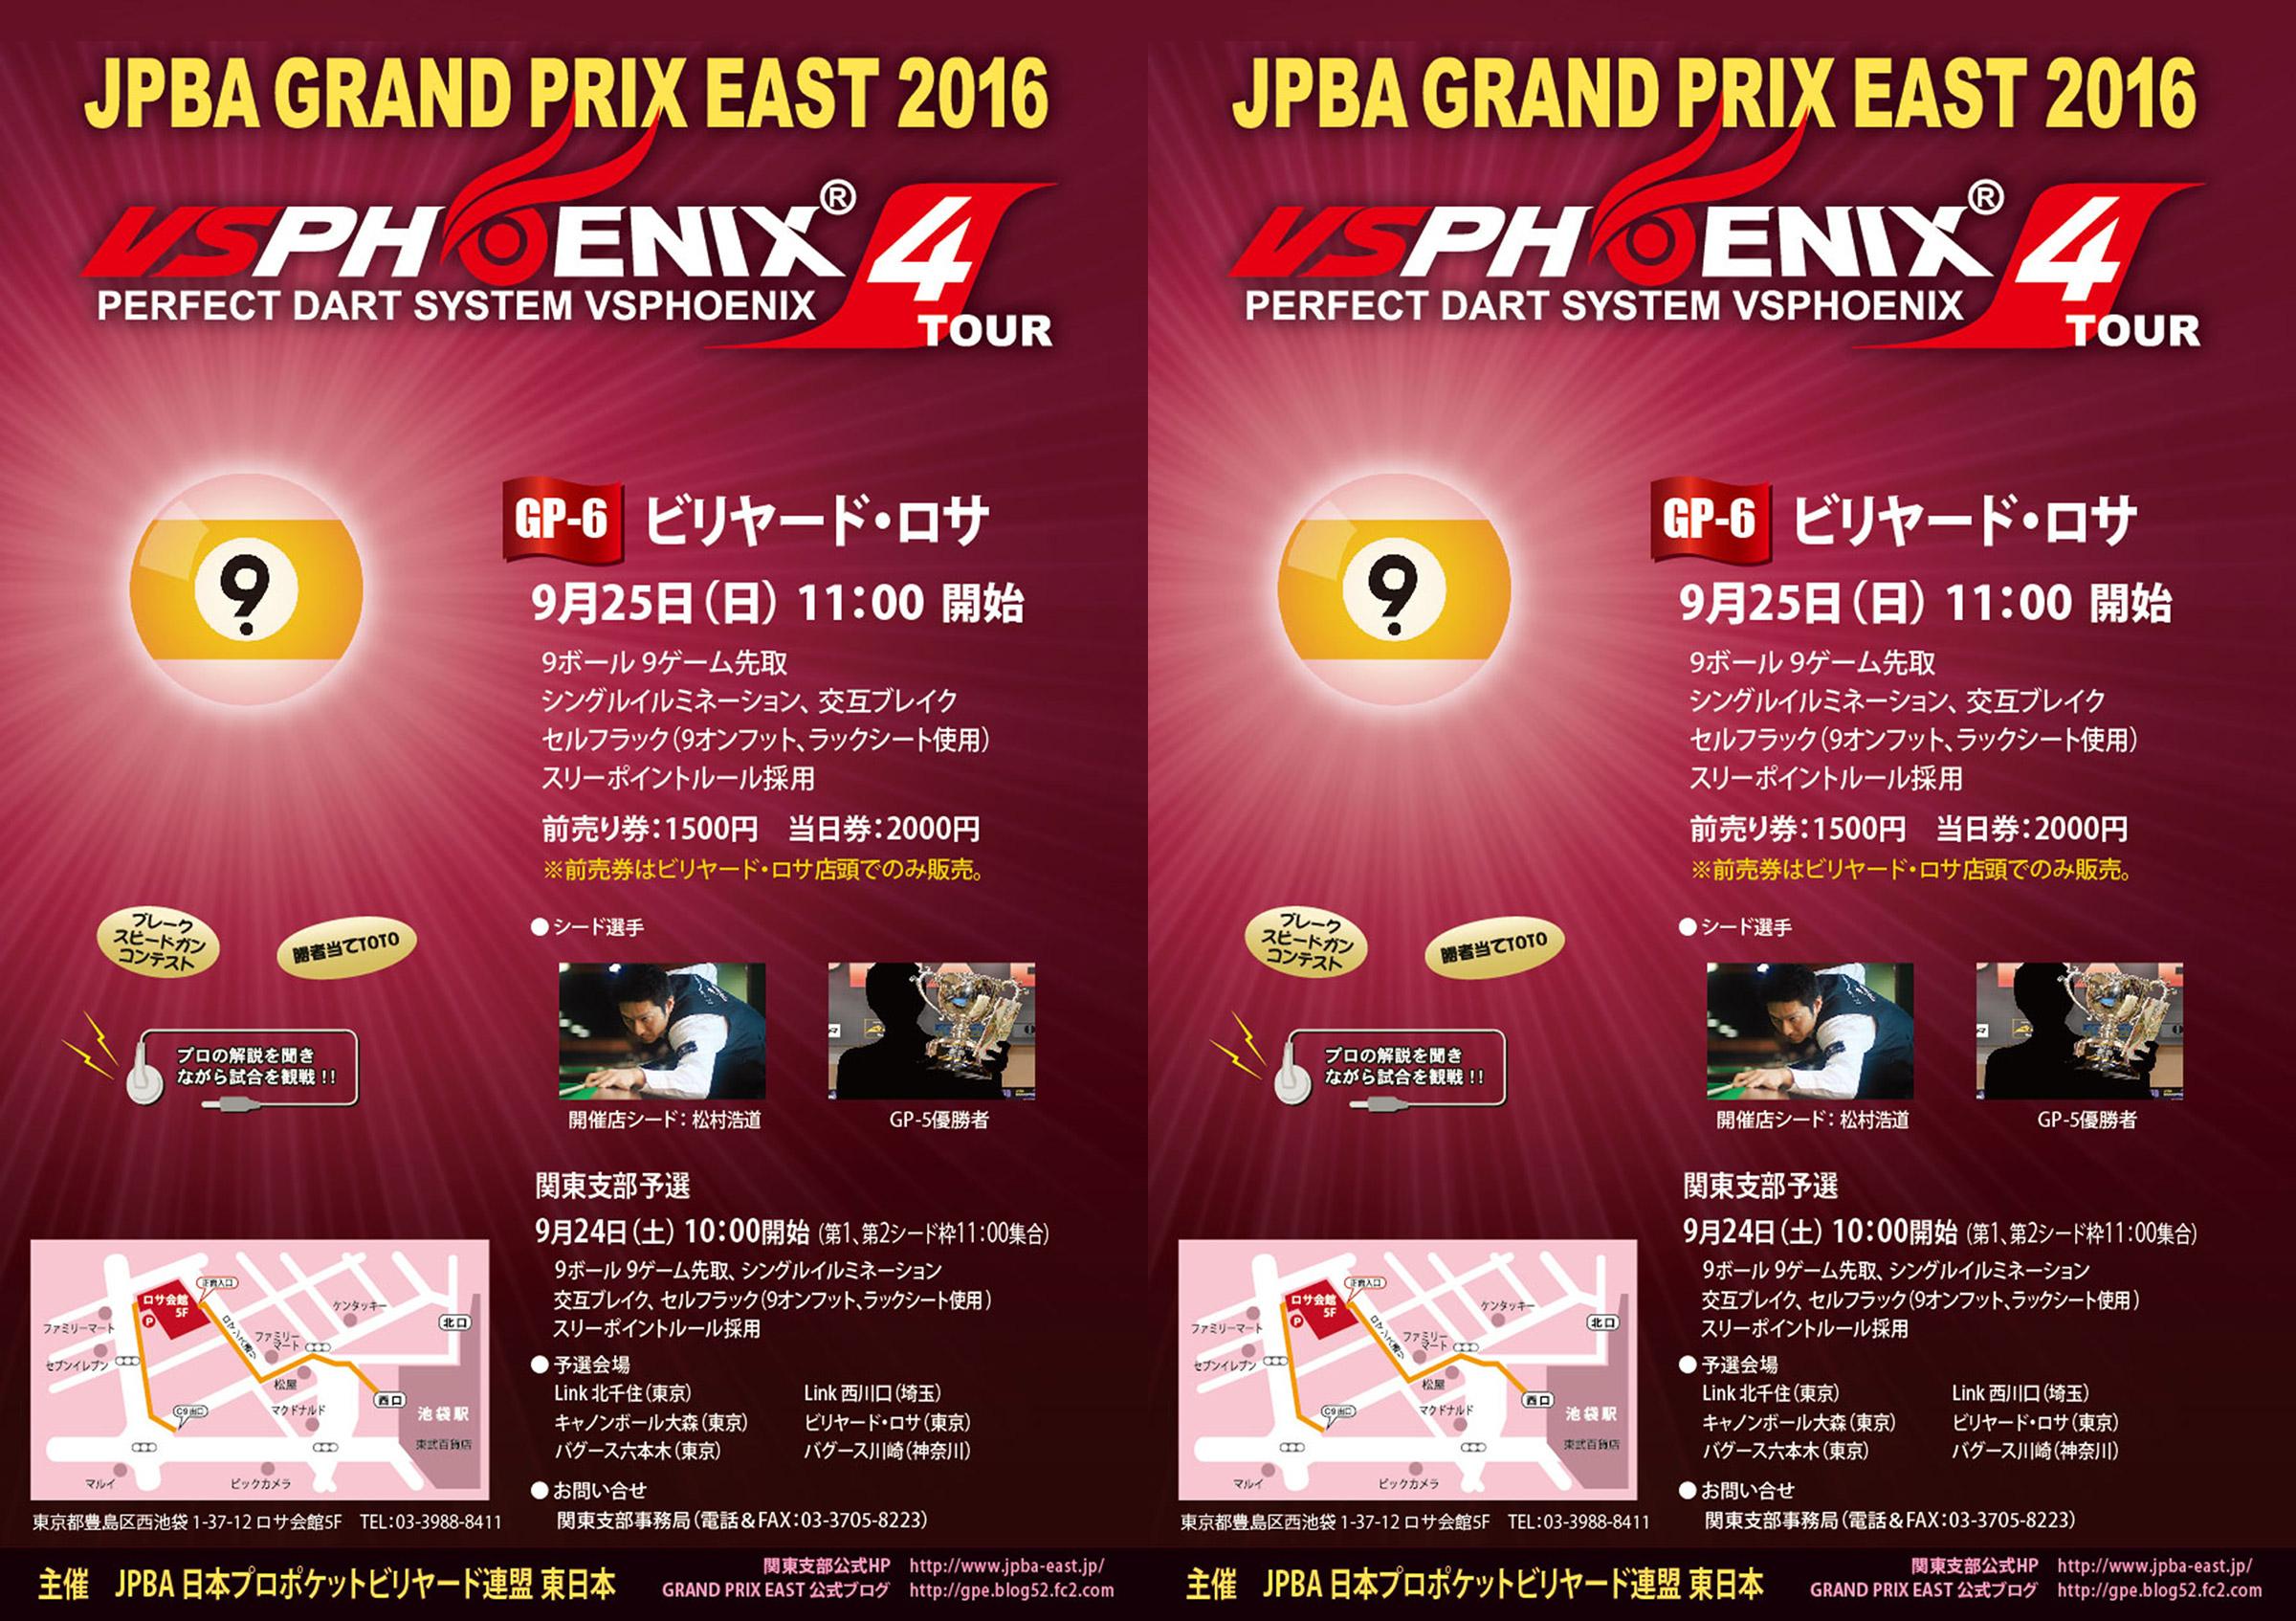 JPBA_GP-6_02-yoko